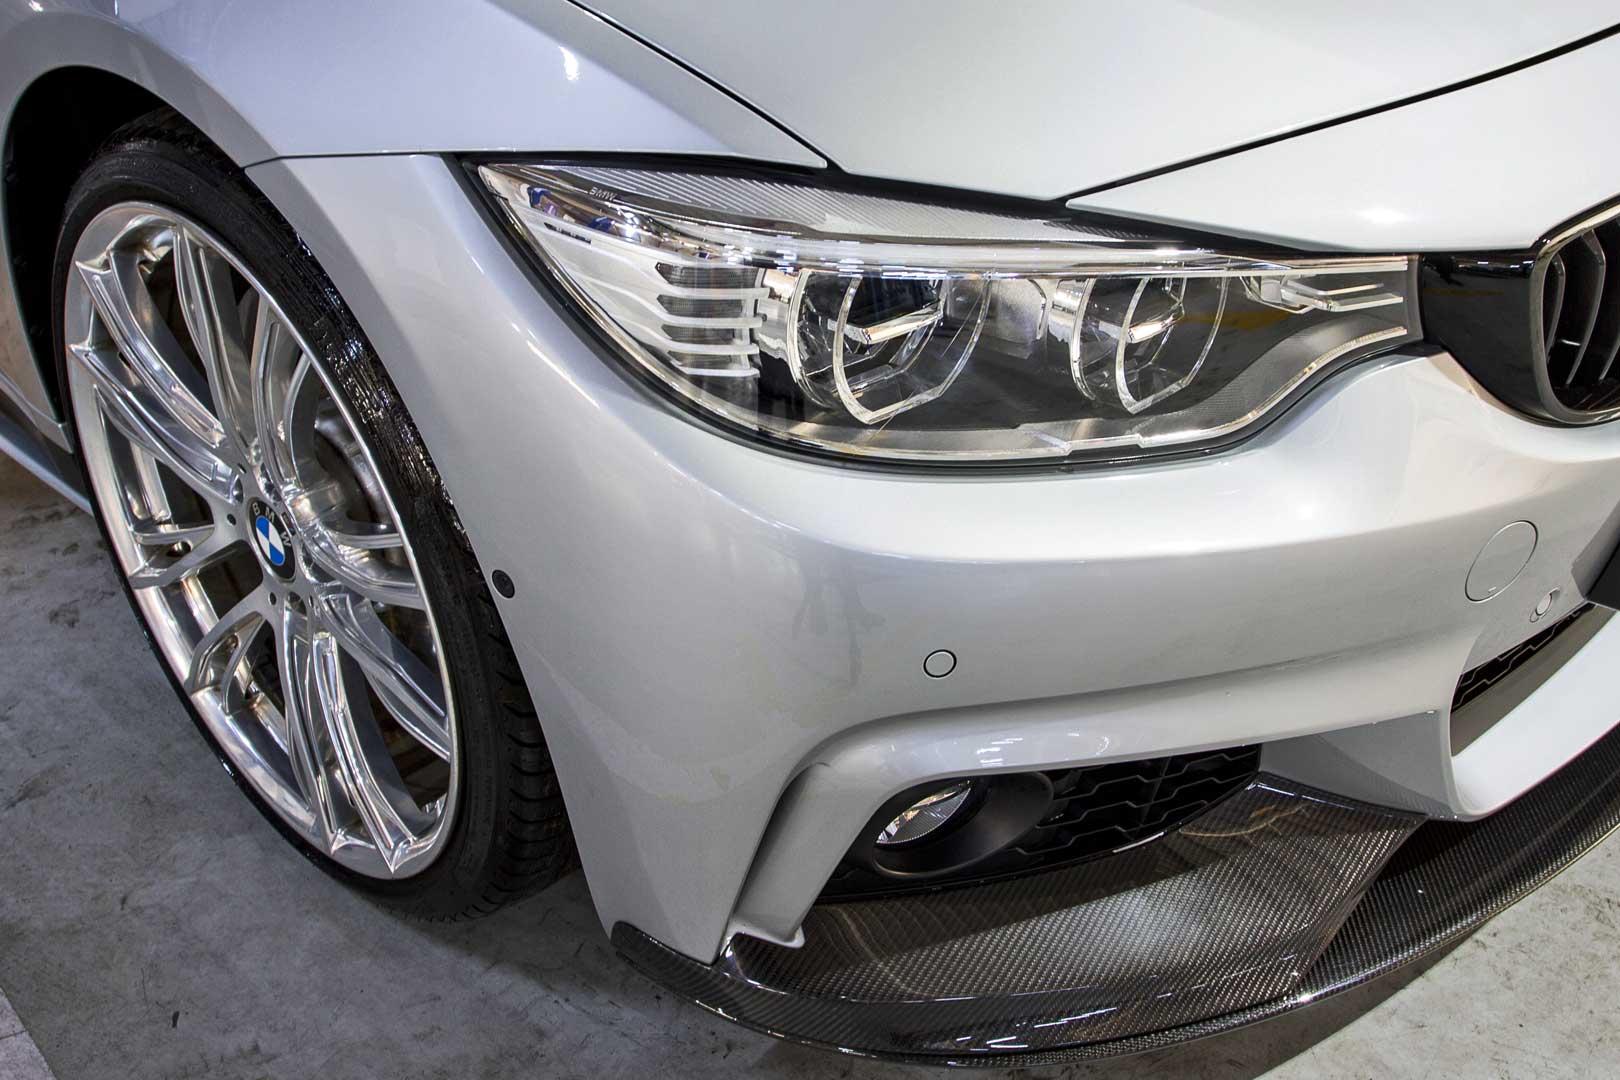 BMW Service Dubai